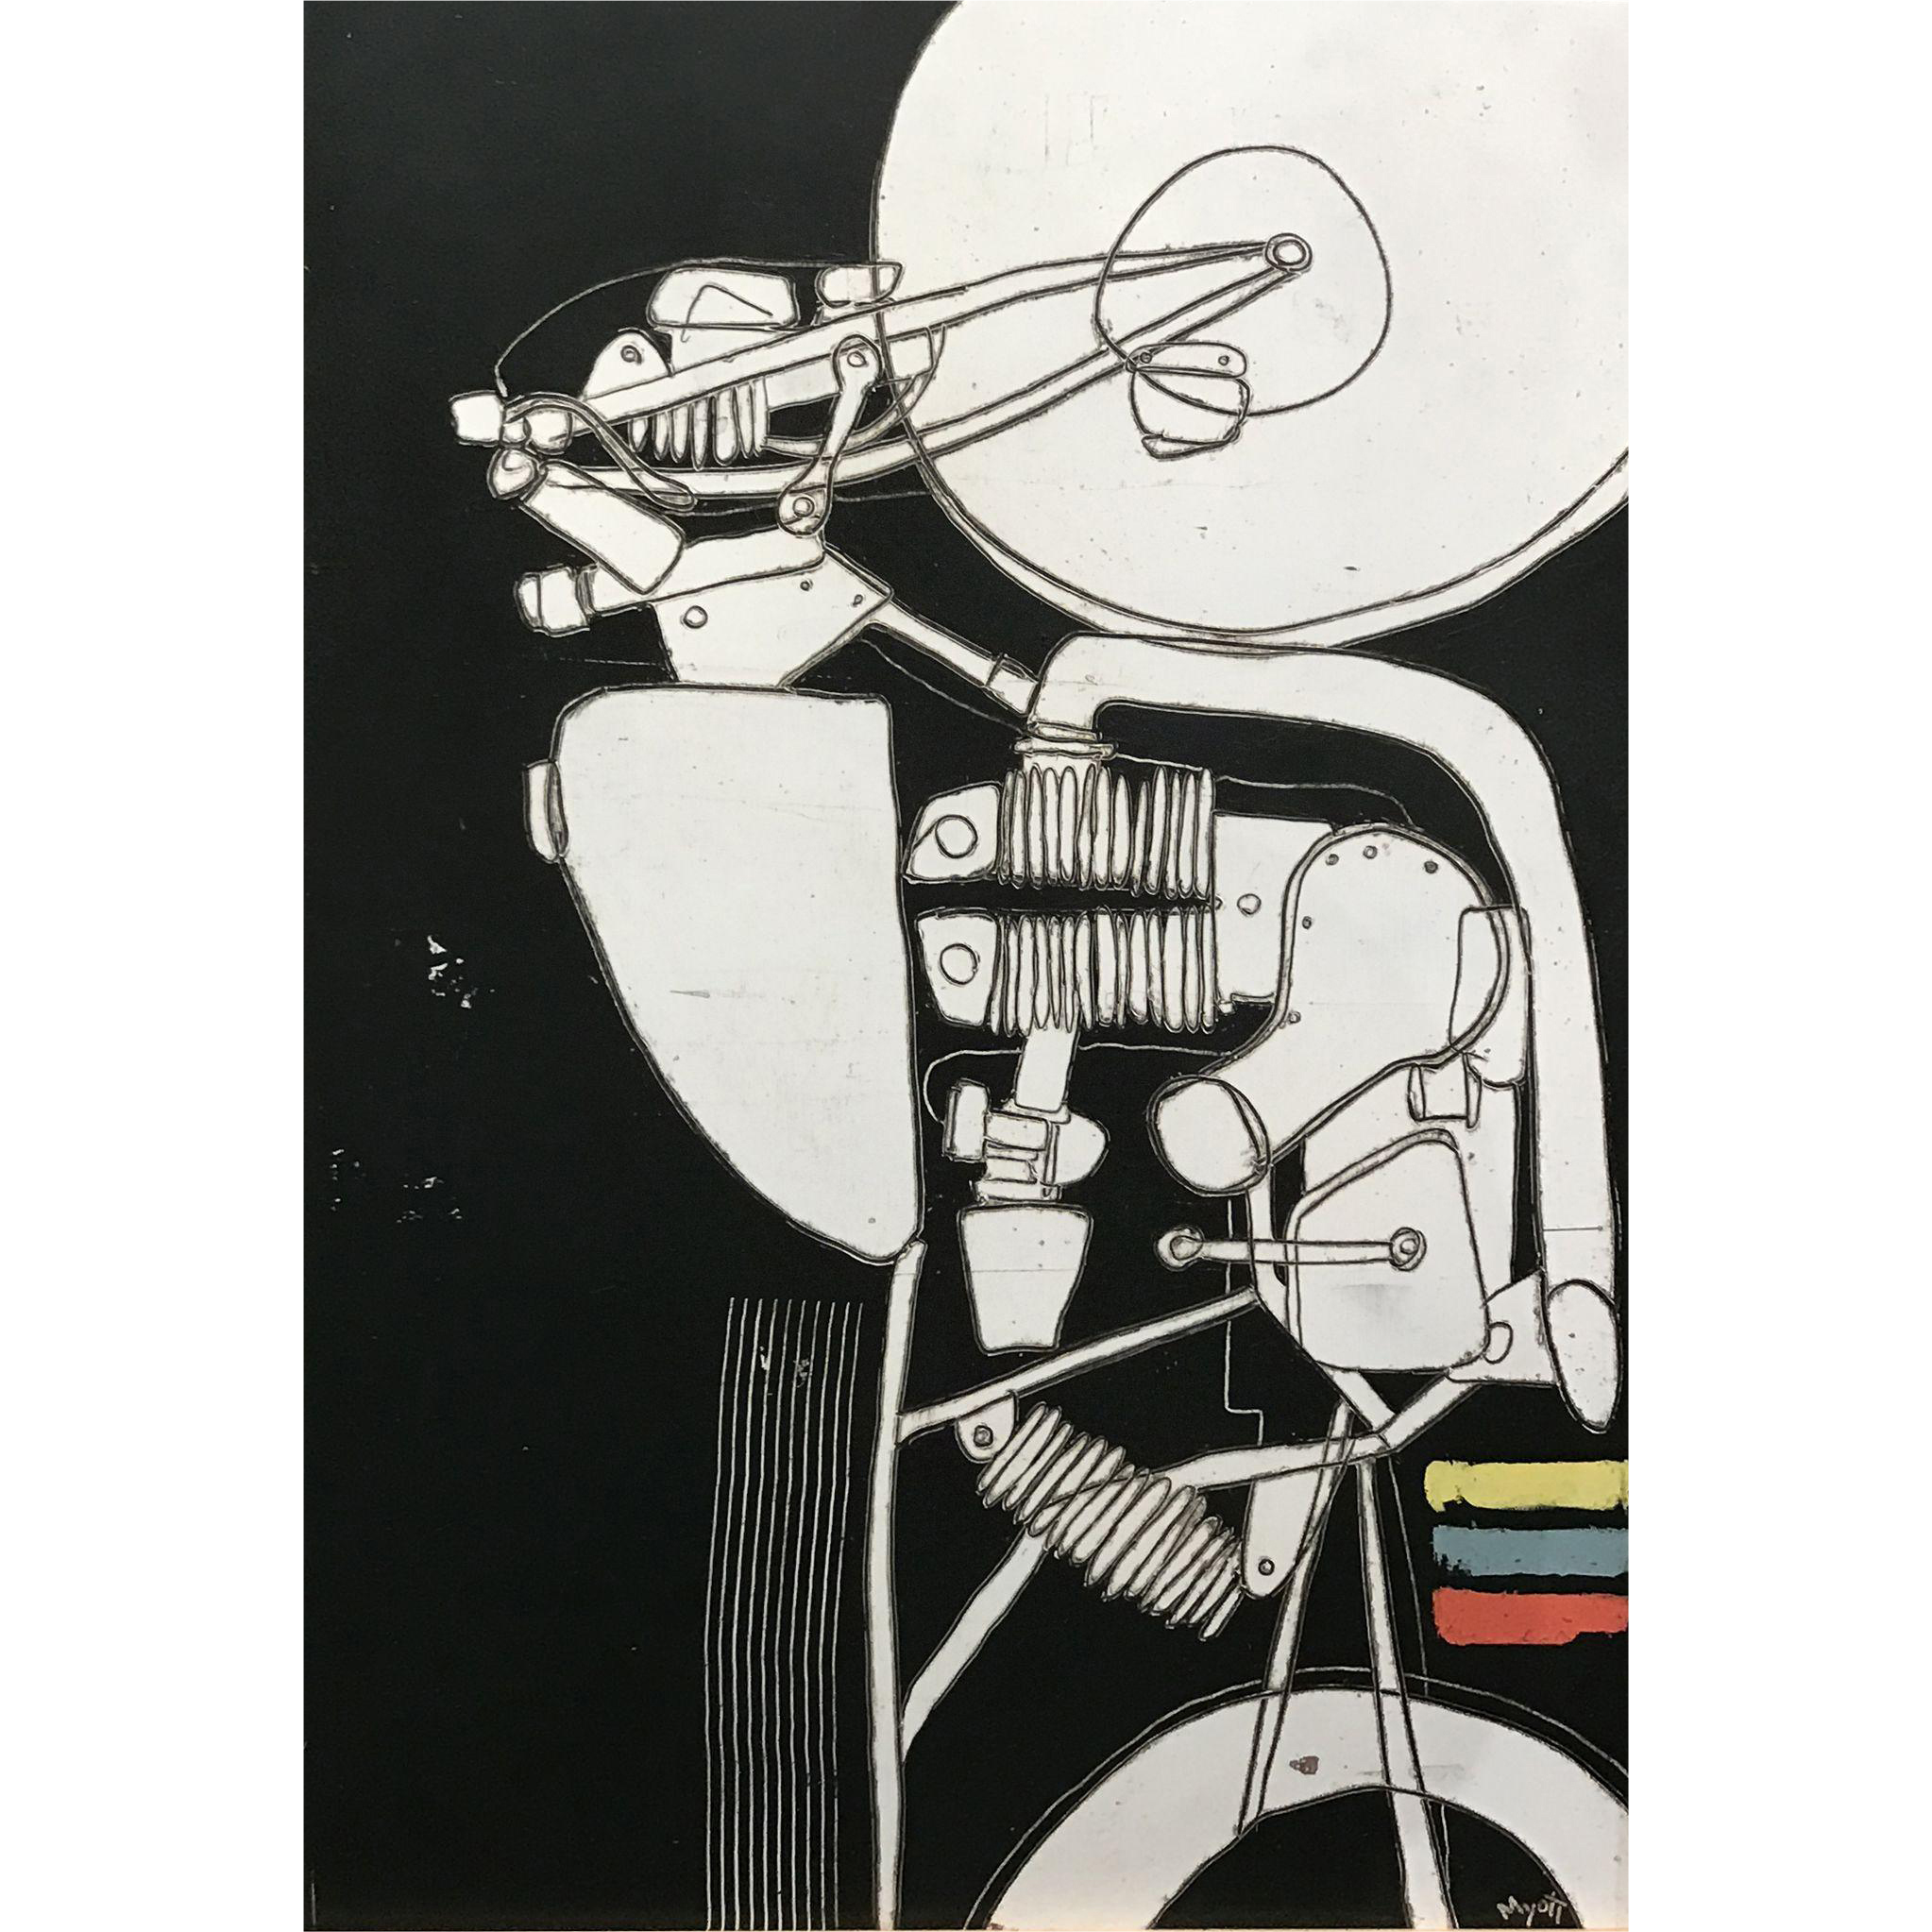 Christopher Myott Modernist Motorcycle Oil Painting - Leaf